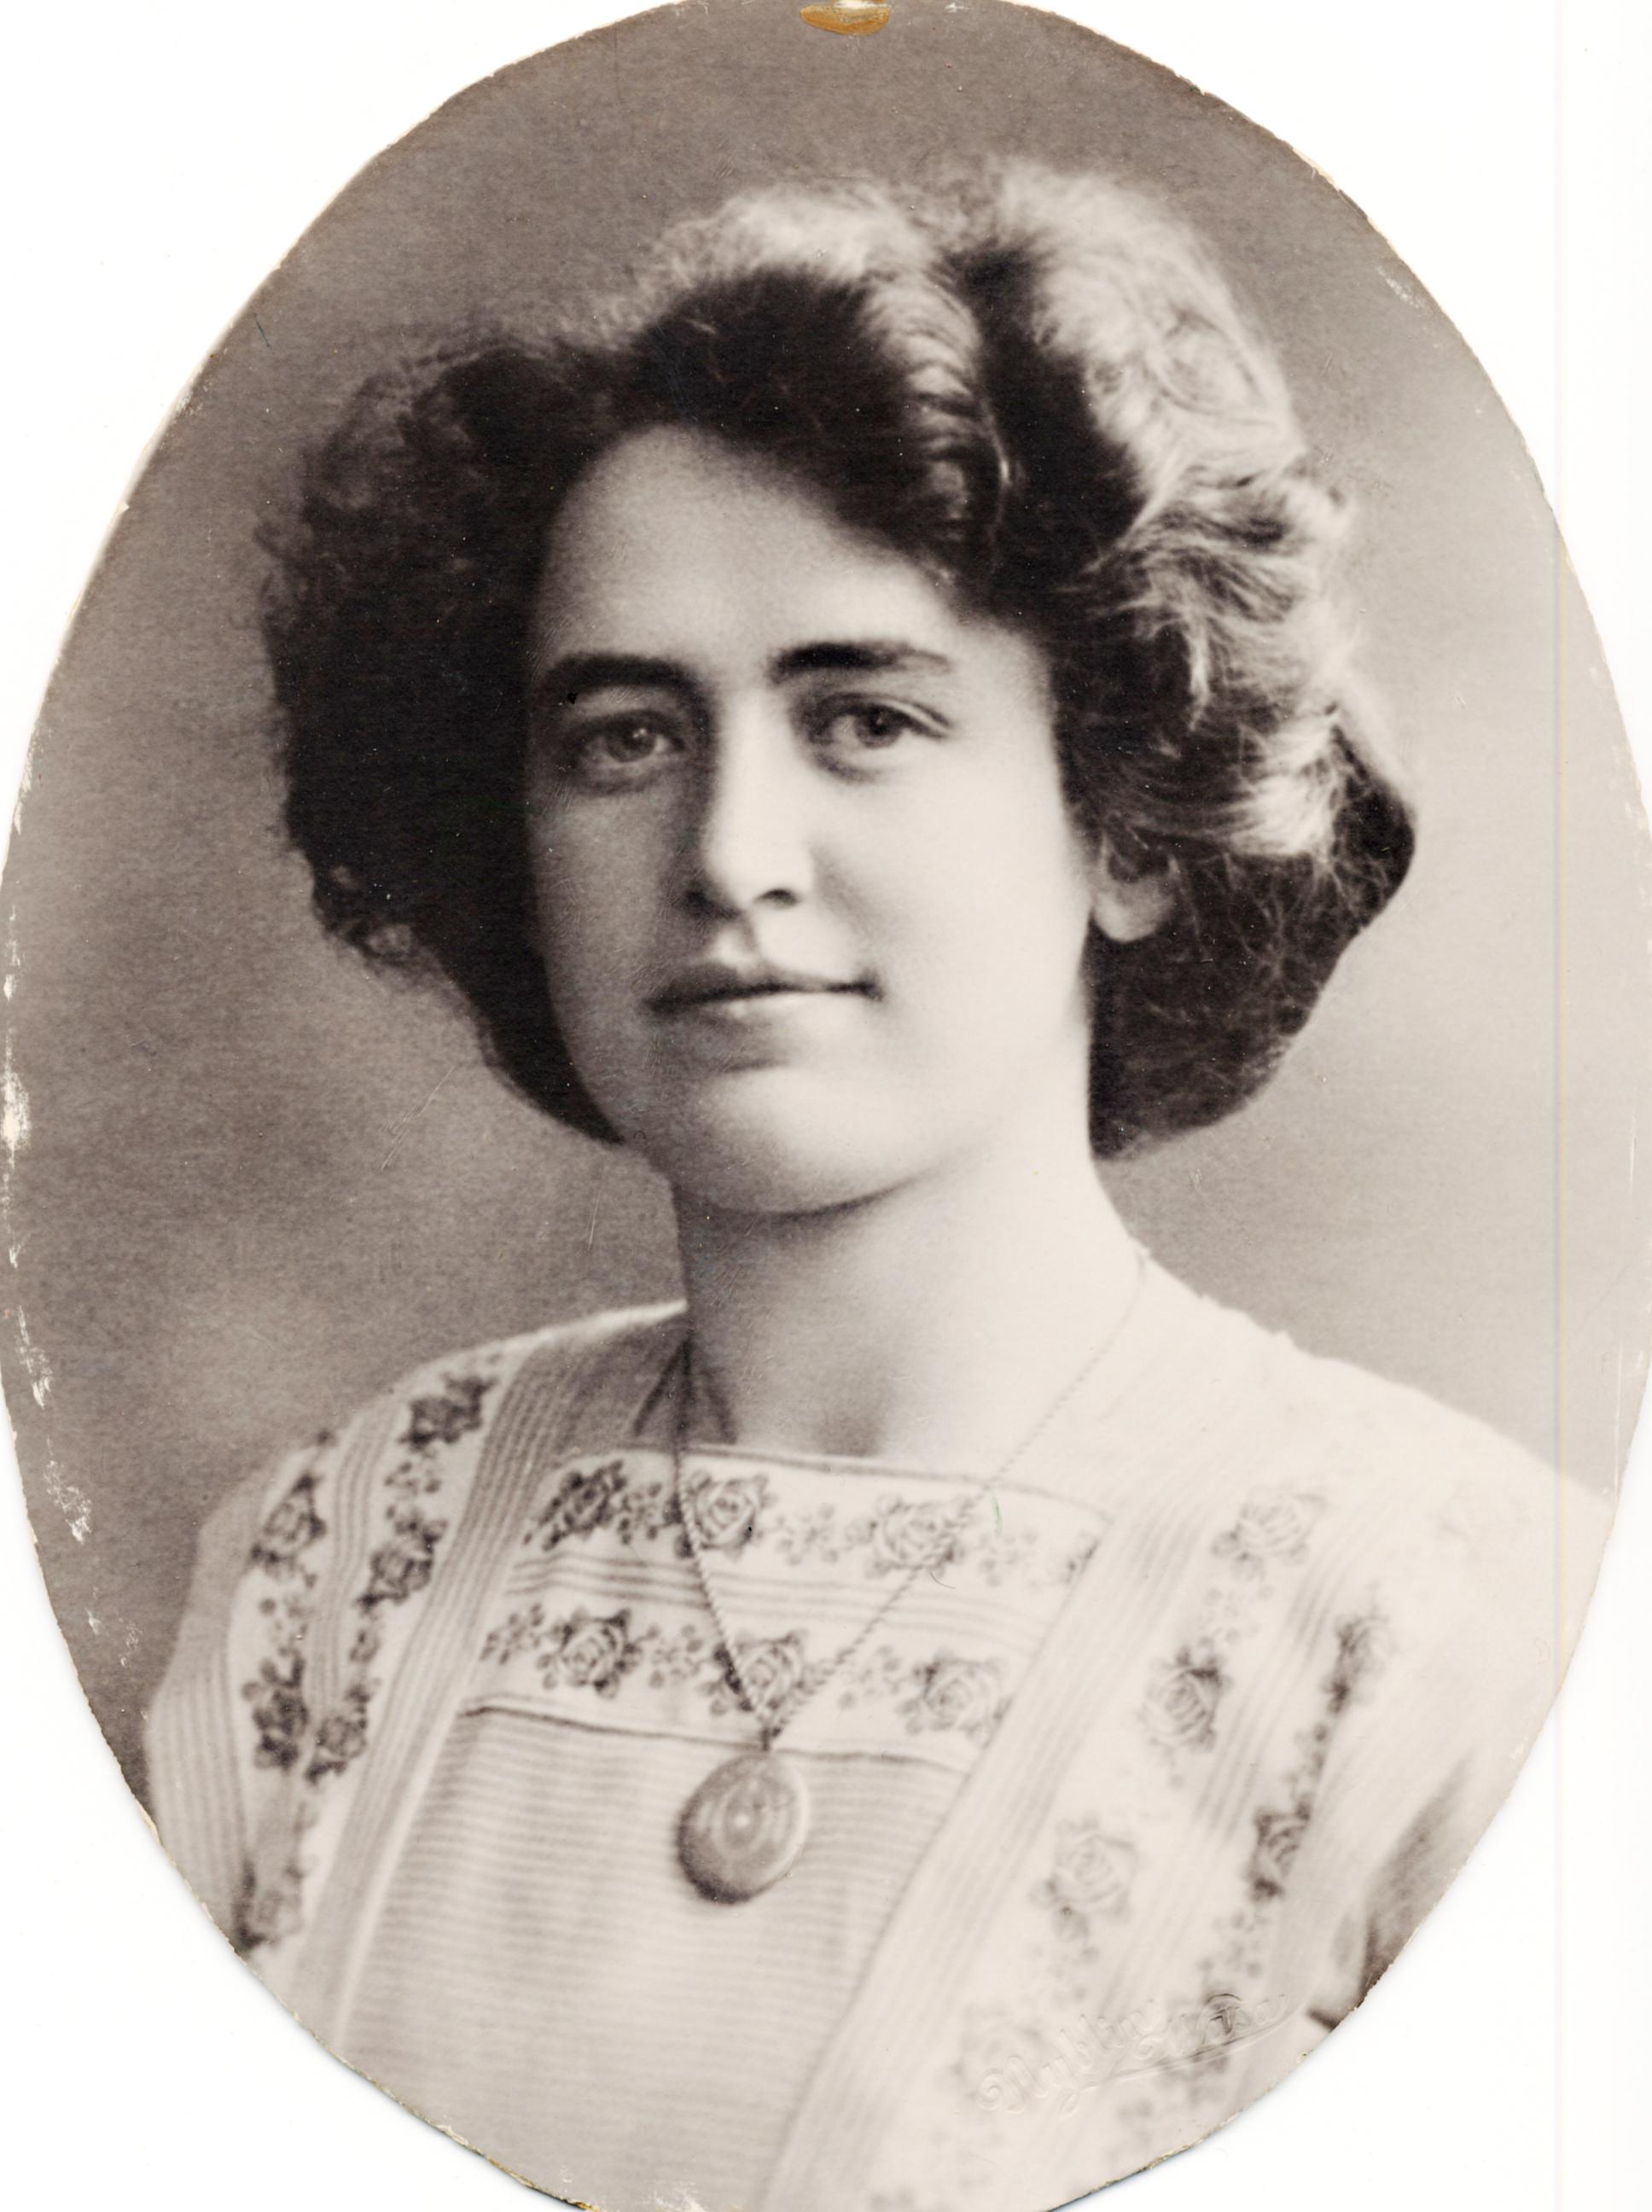 Victoria Heikel  (1883-1919)